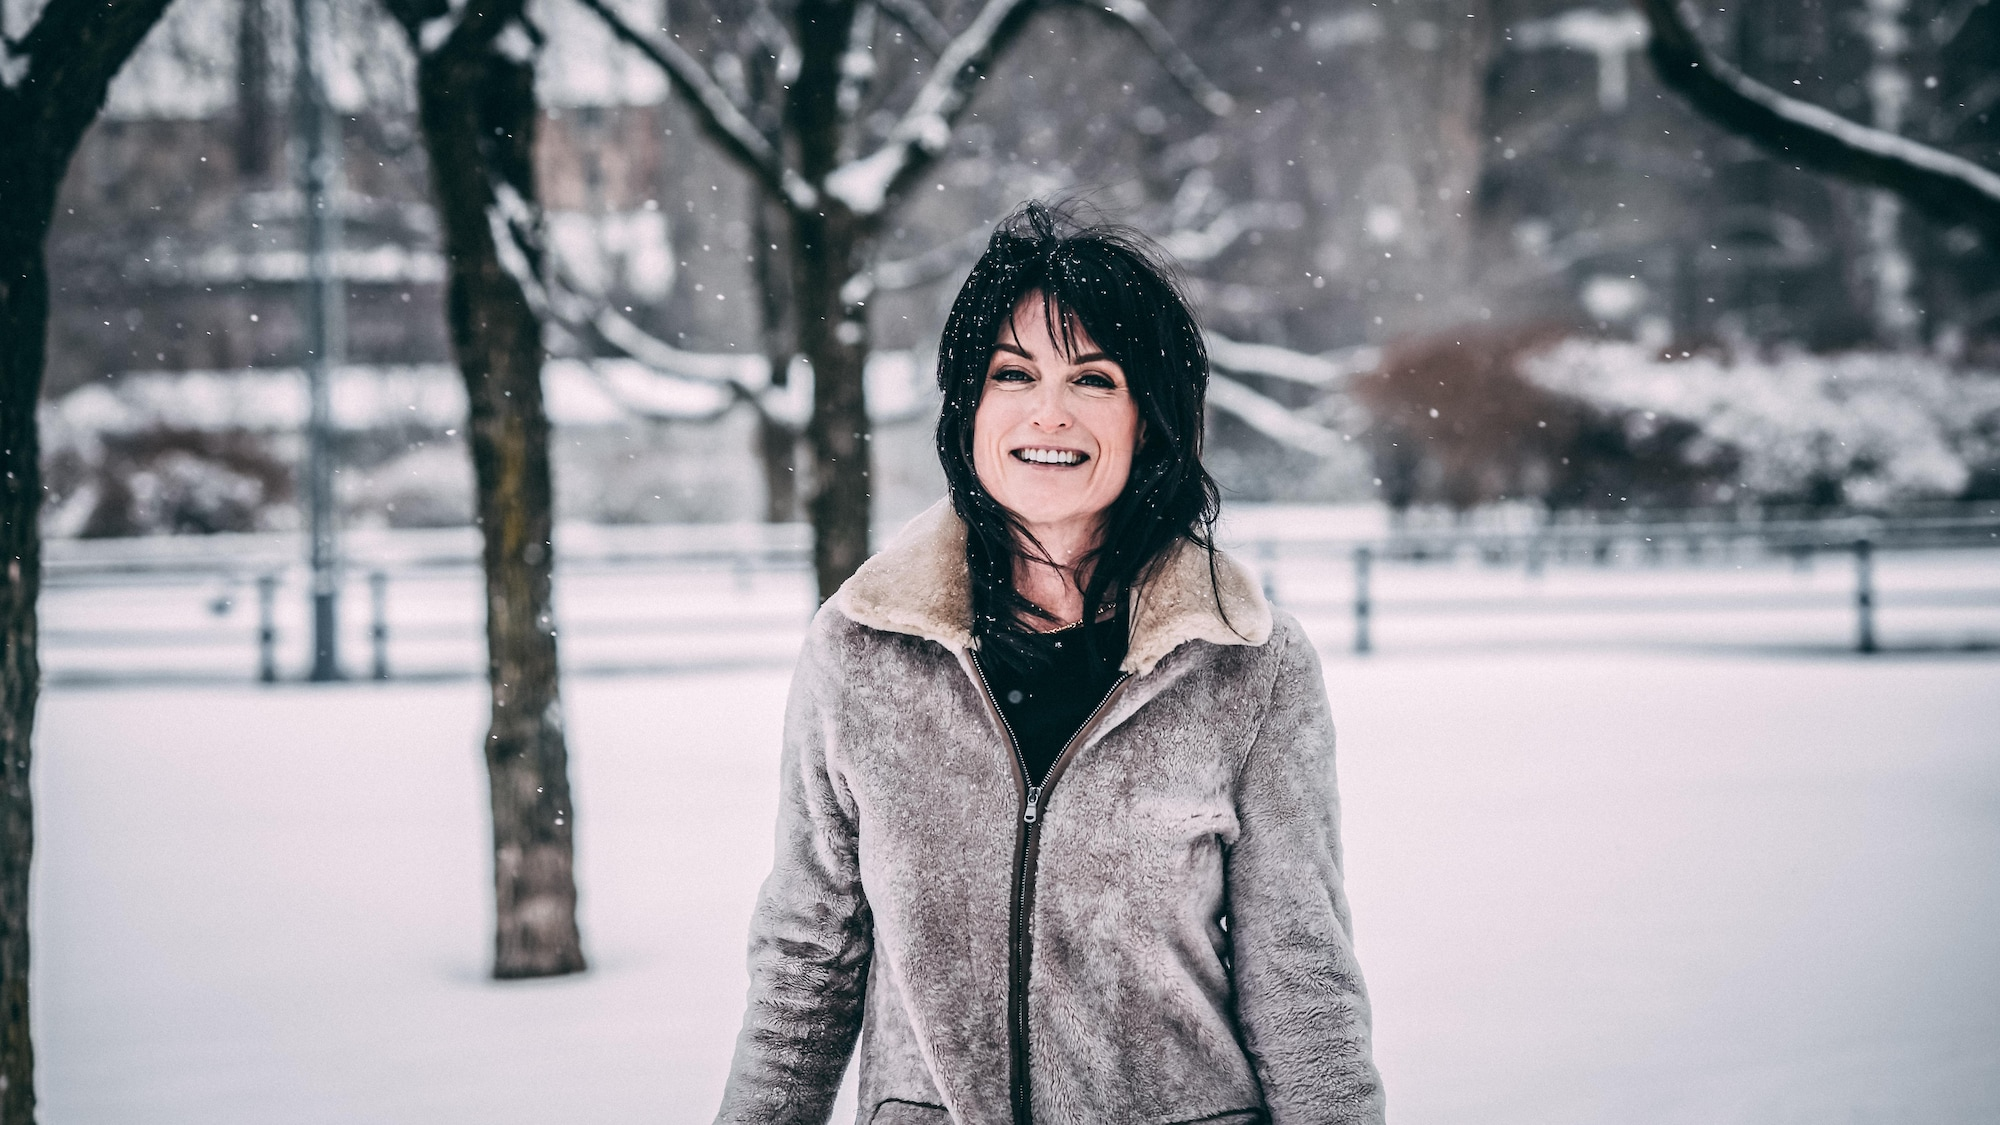 Alexandra Croft sourit en marchant dans la neige.